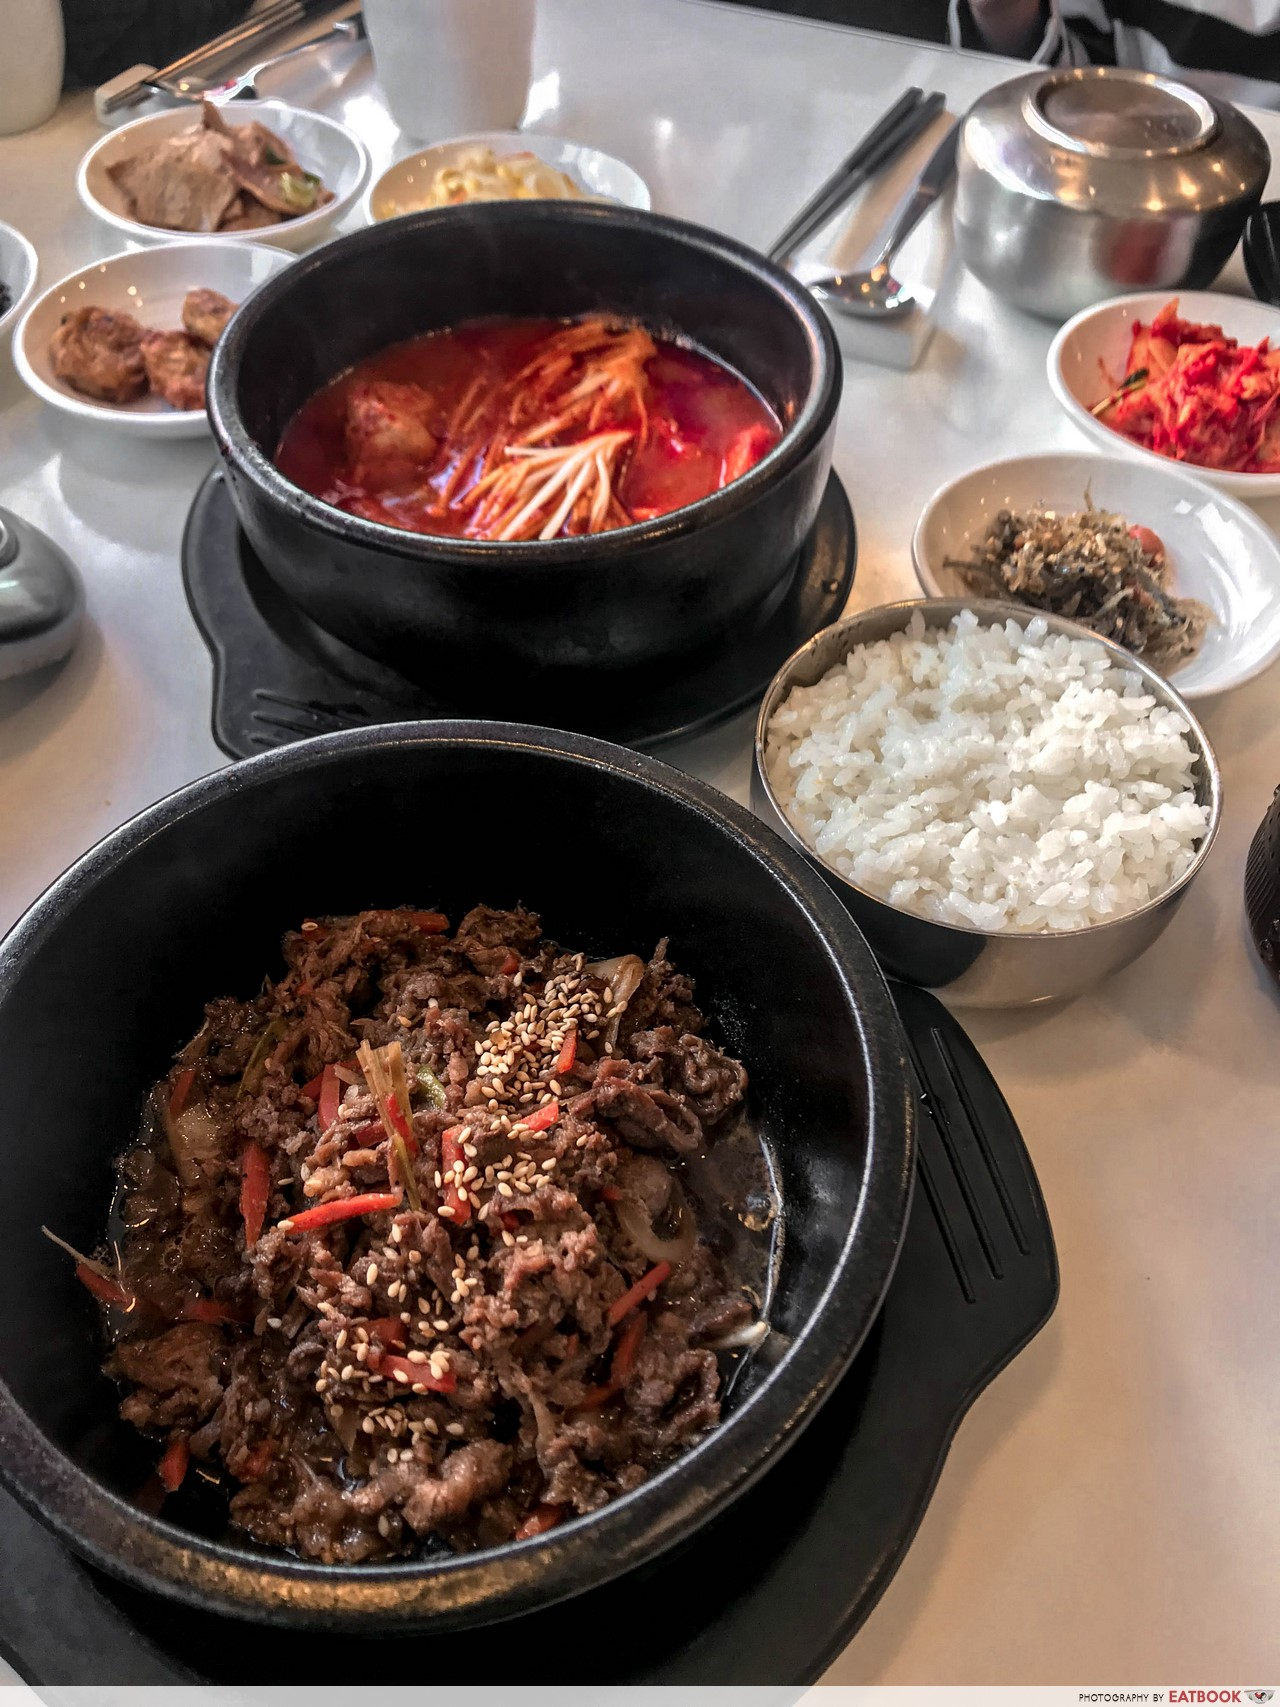 Halal Food places In Seoul - Makan Halal Food Restaurant